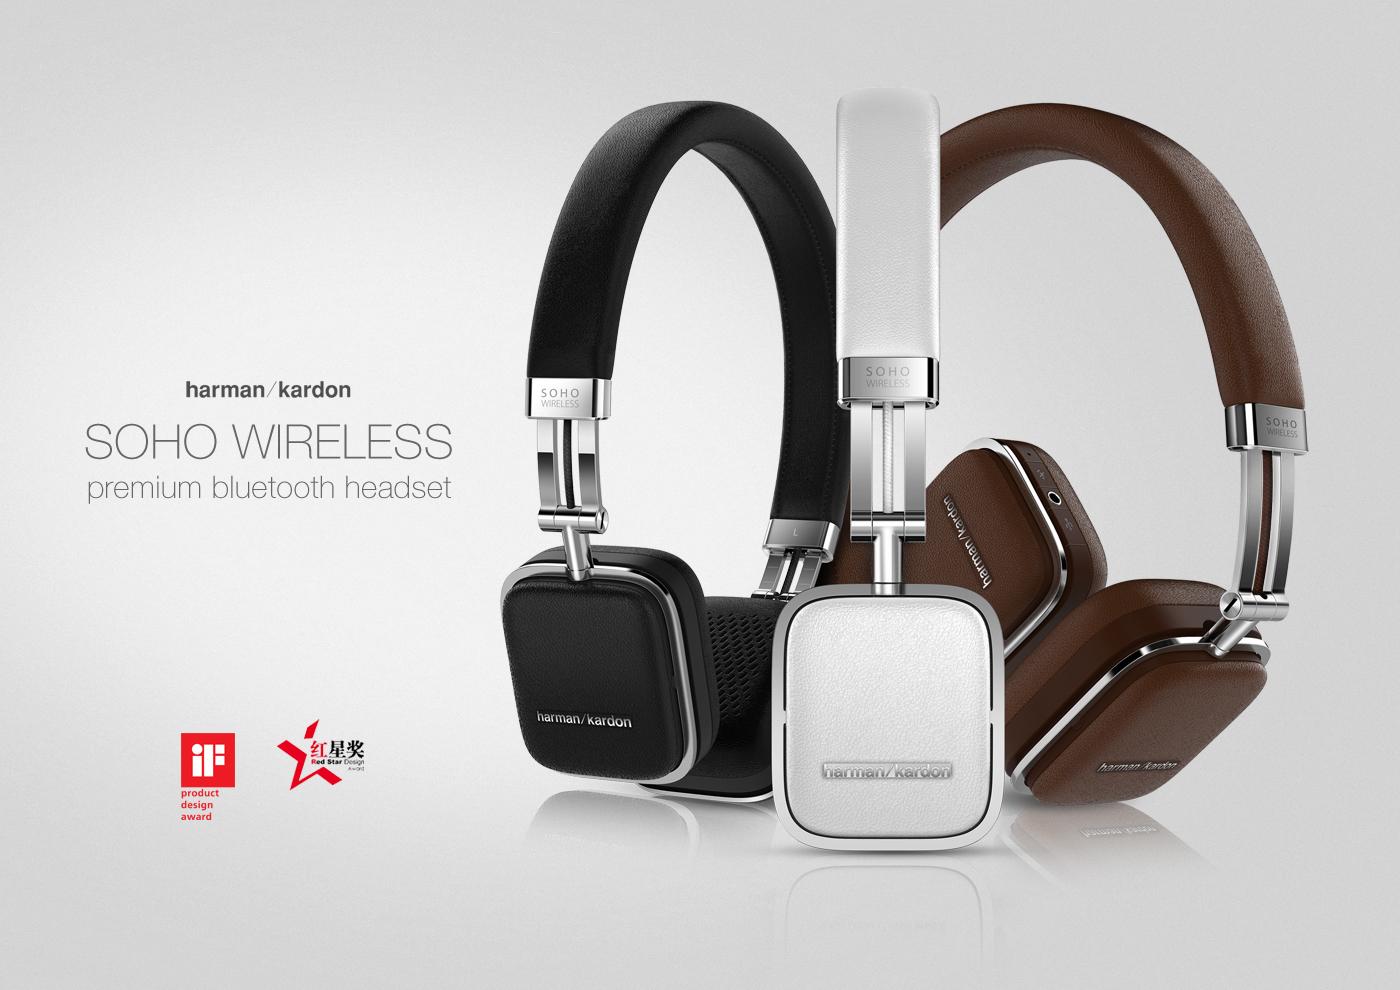 harman kardon headphones soho wireless on behance. Black Bedroom Furniture Sets. Home Design Ideas